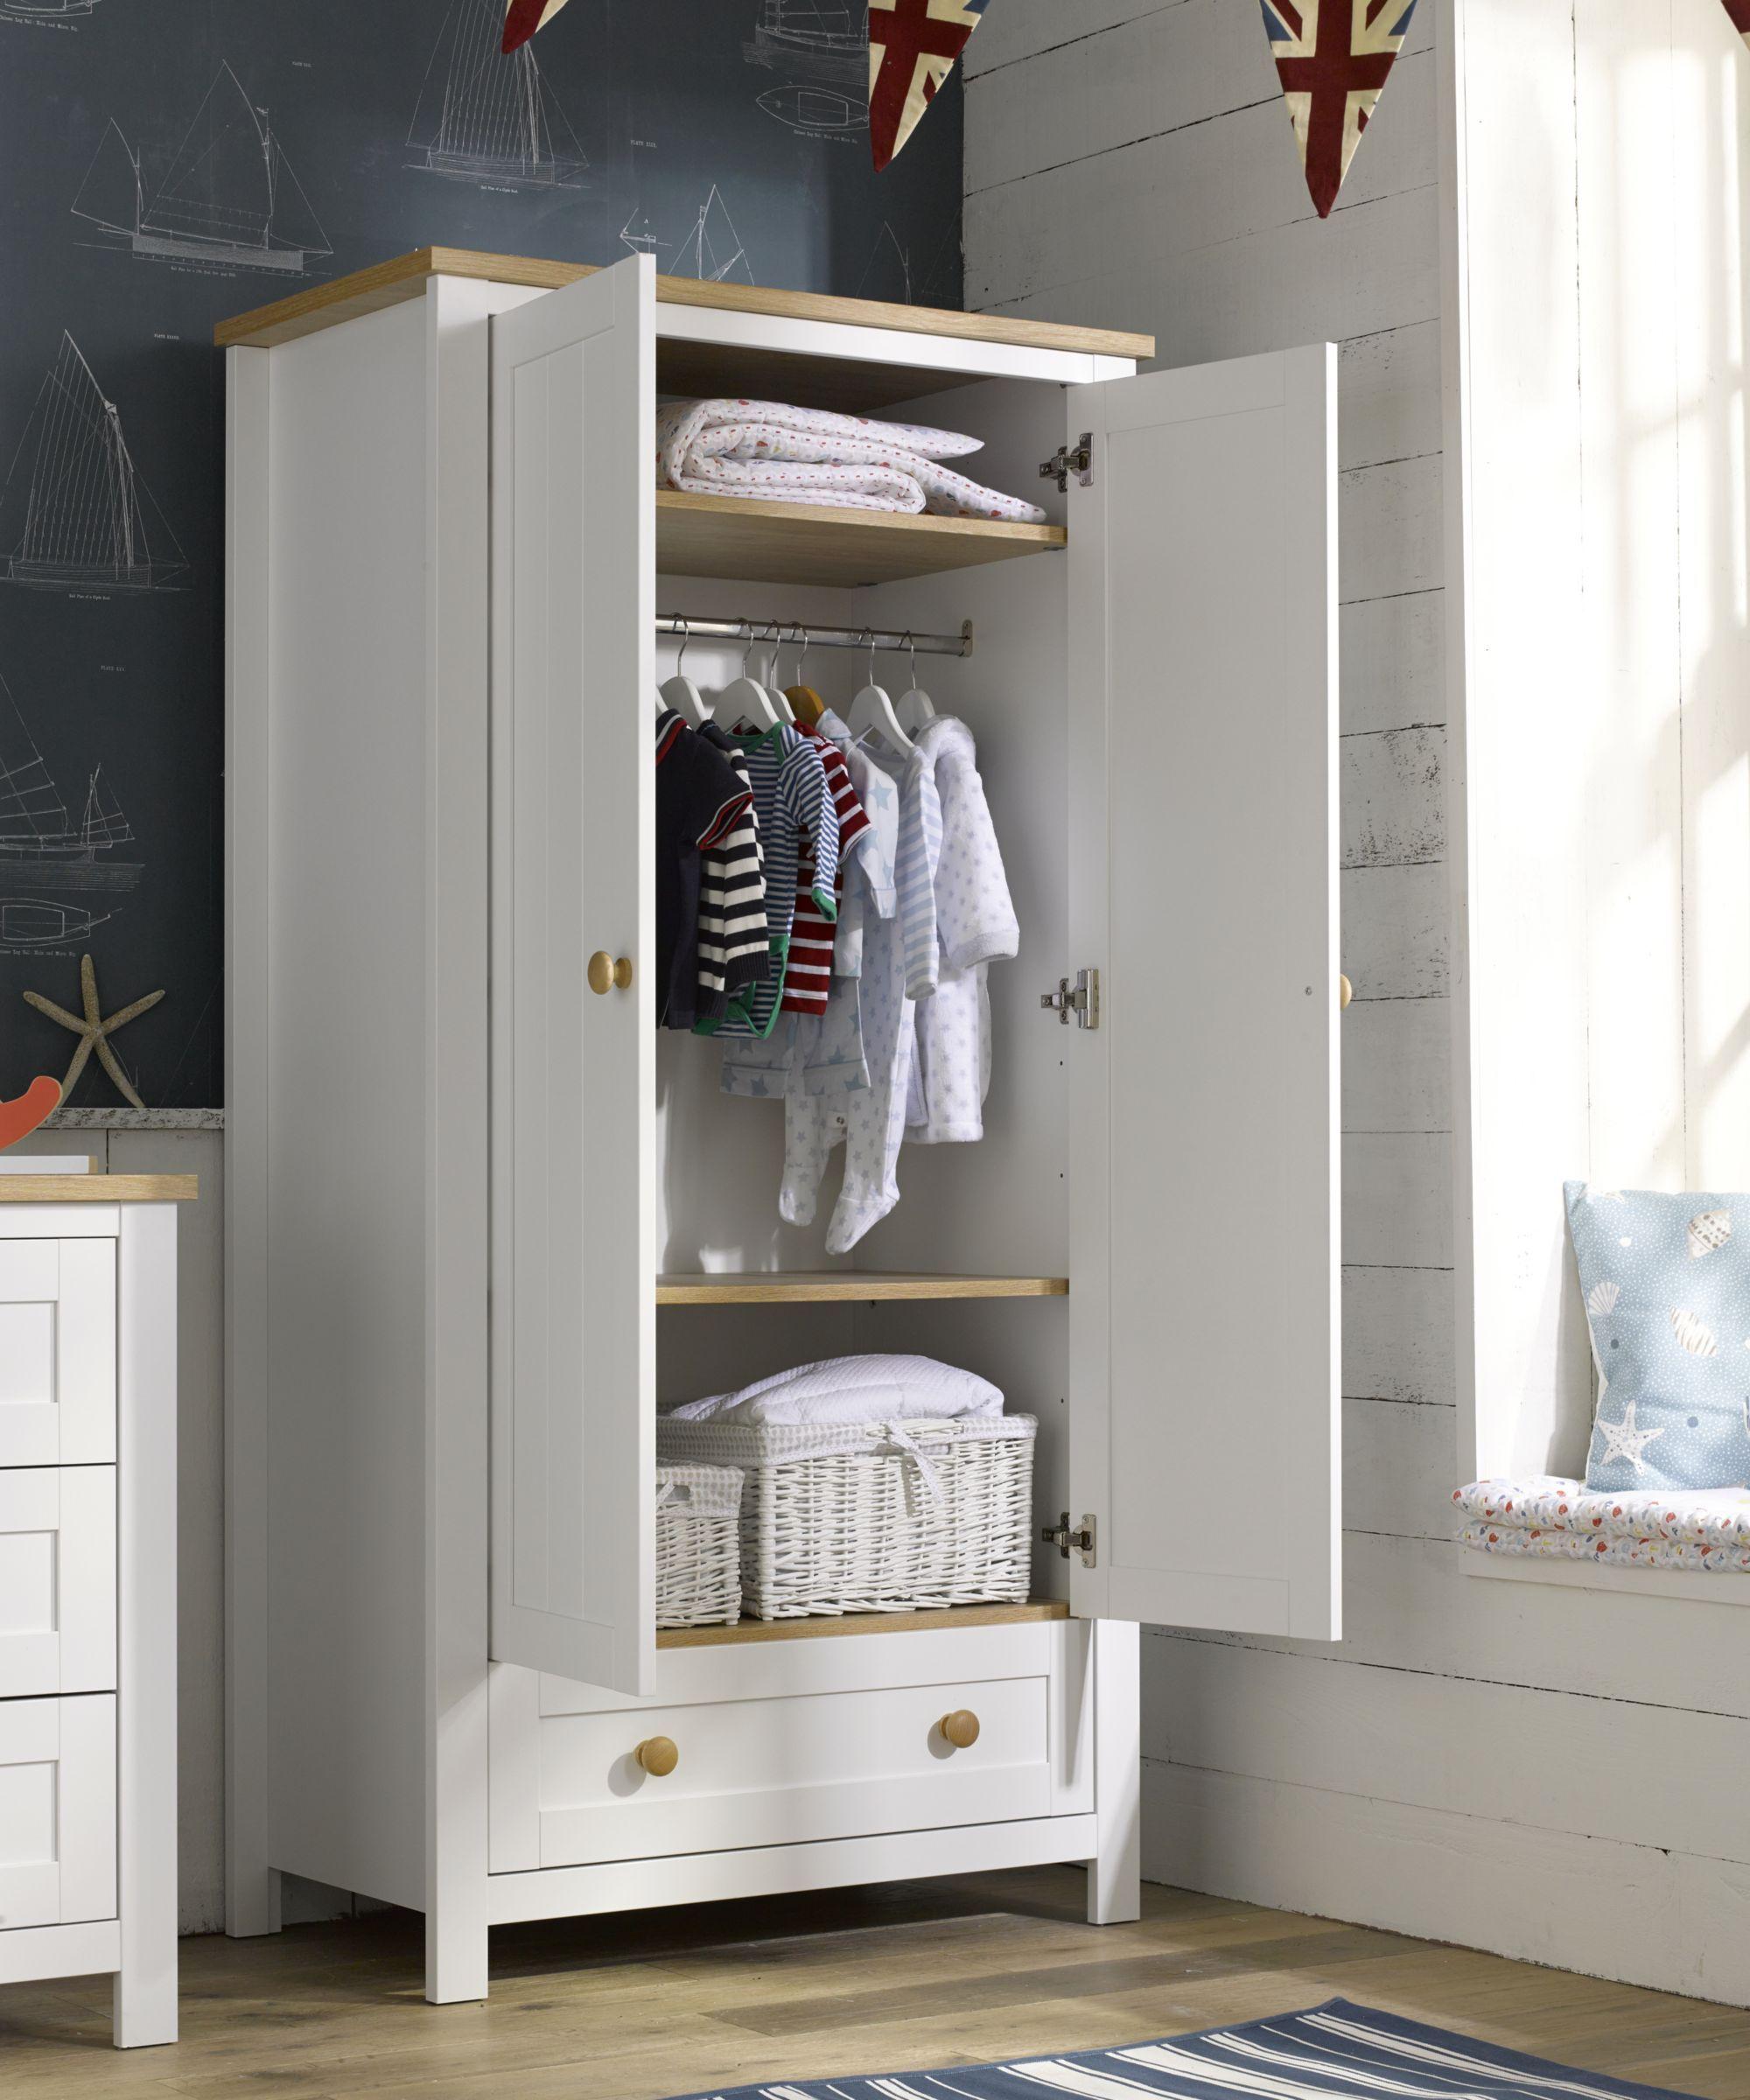 Mothercare Lulworth Wardrobe - wardrobes & tallboys - Mothercare